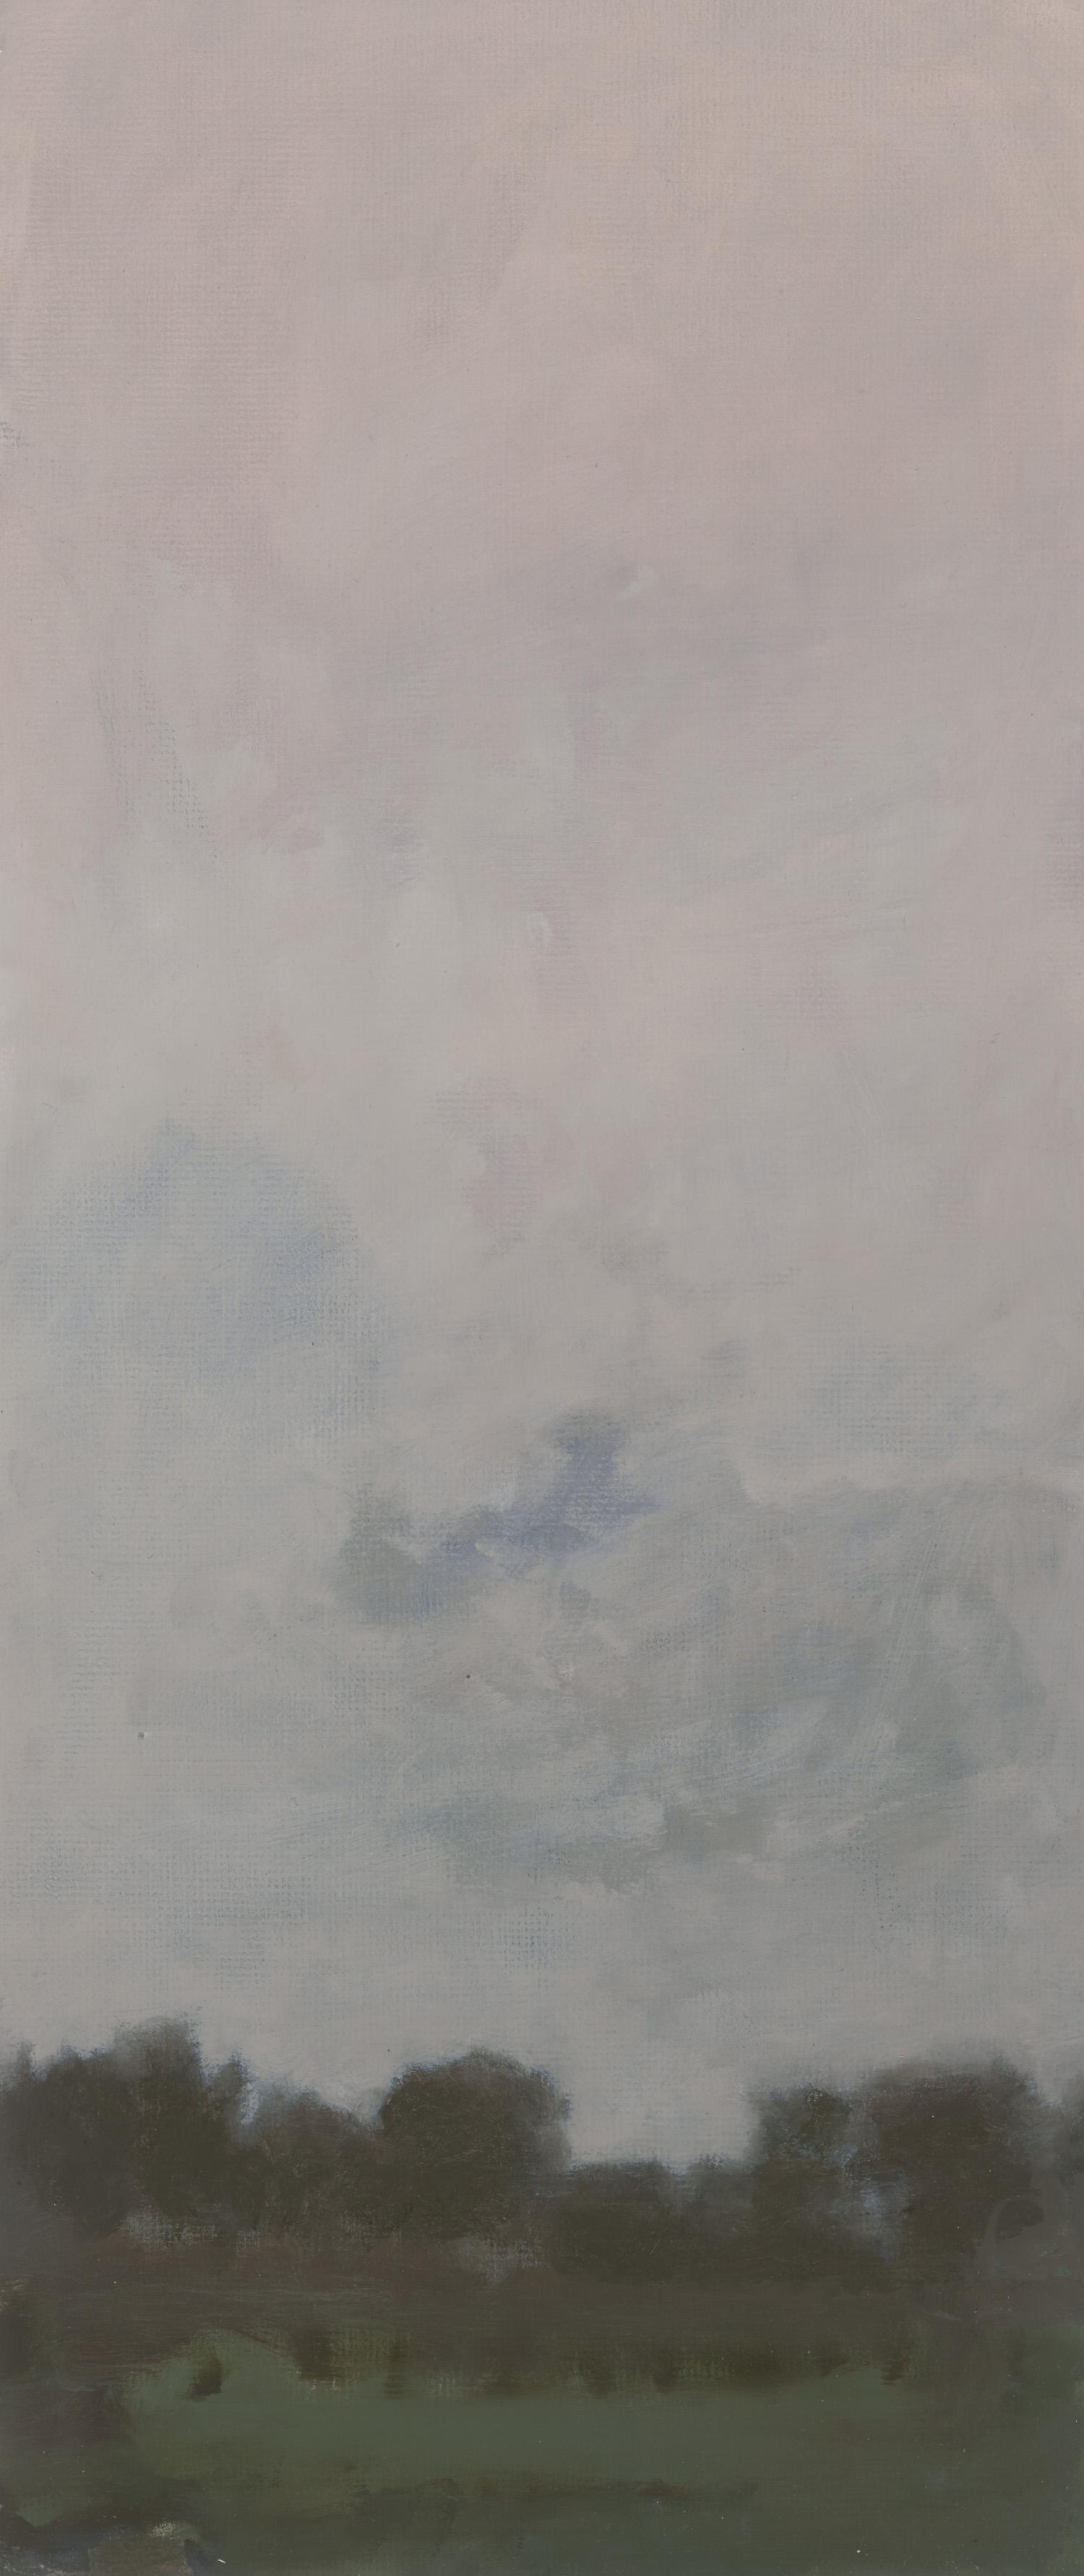 GREG WOOD  Oakridge,   2016  oil on matt board, framed  67.4 x 28.6 cm SOLD